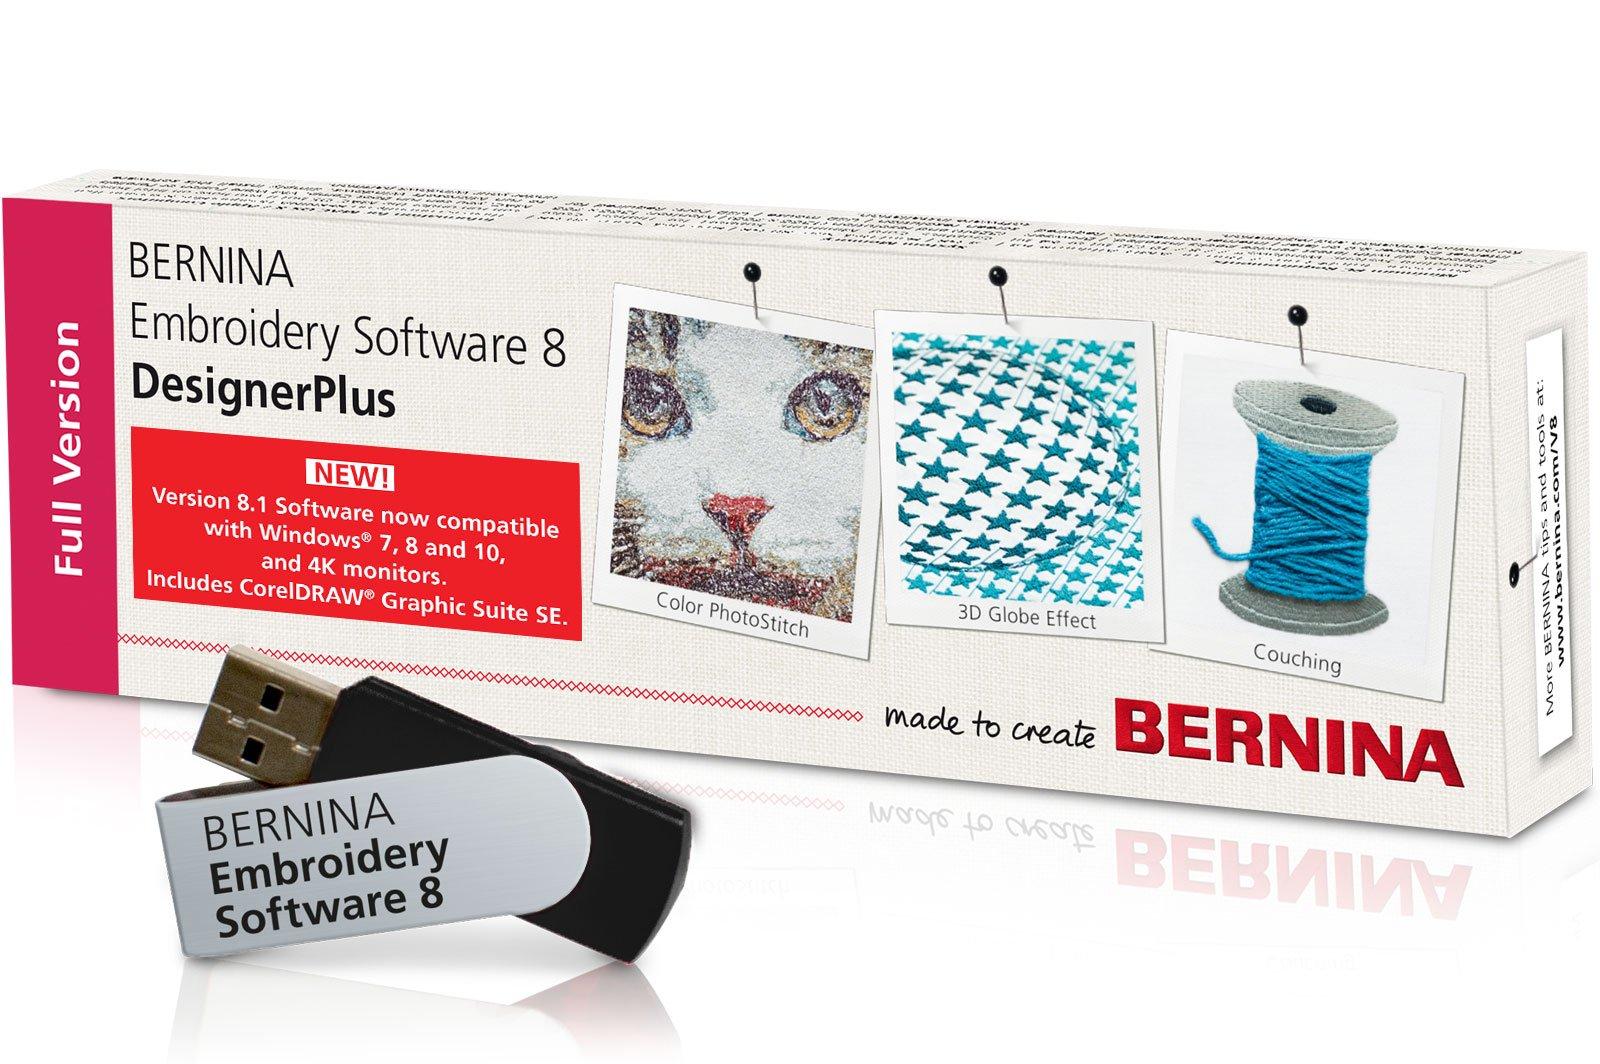 BERNINA Embroidery Software 8.2